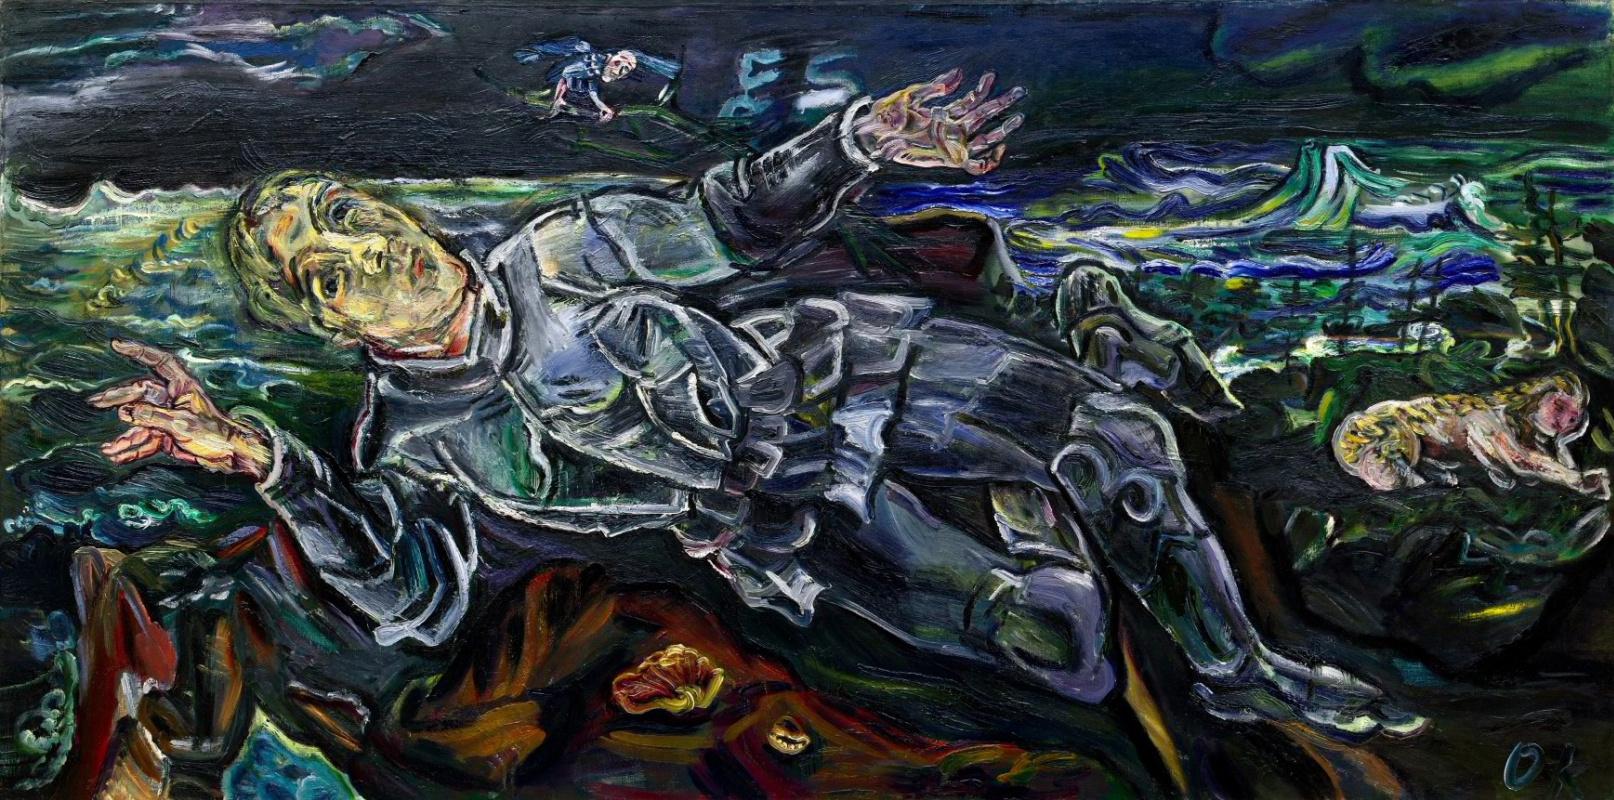 Oskar Kokoschka. A knight errant (Self-portrait)